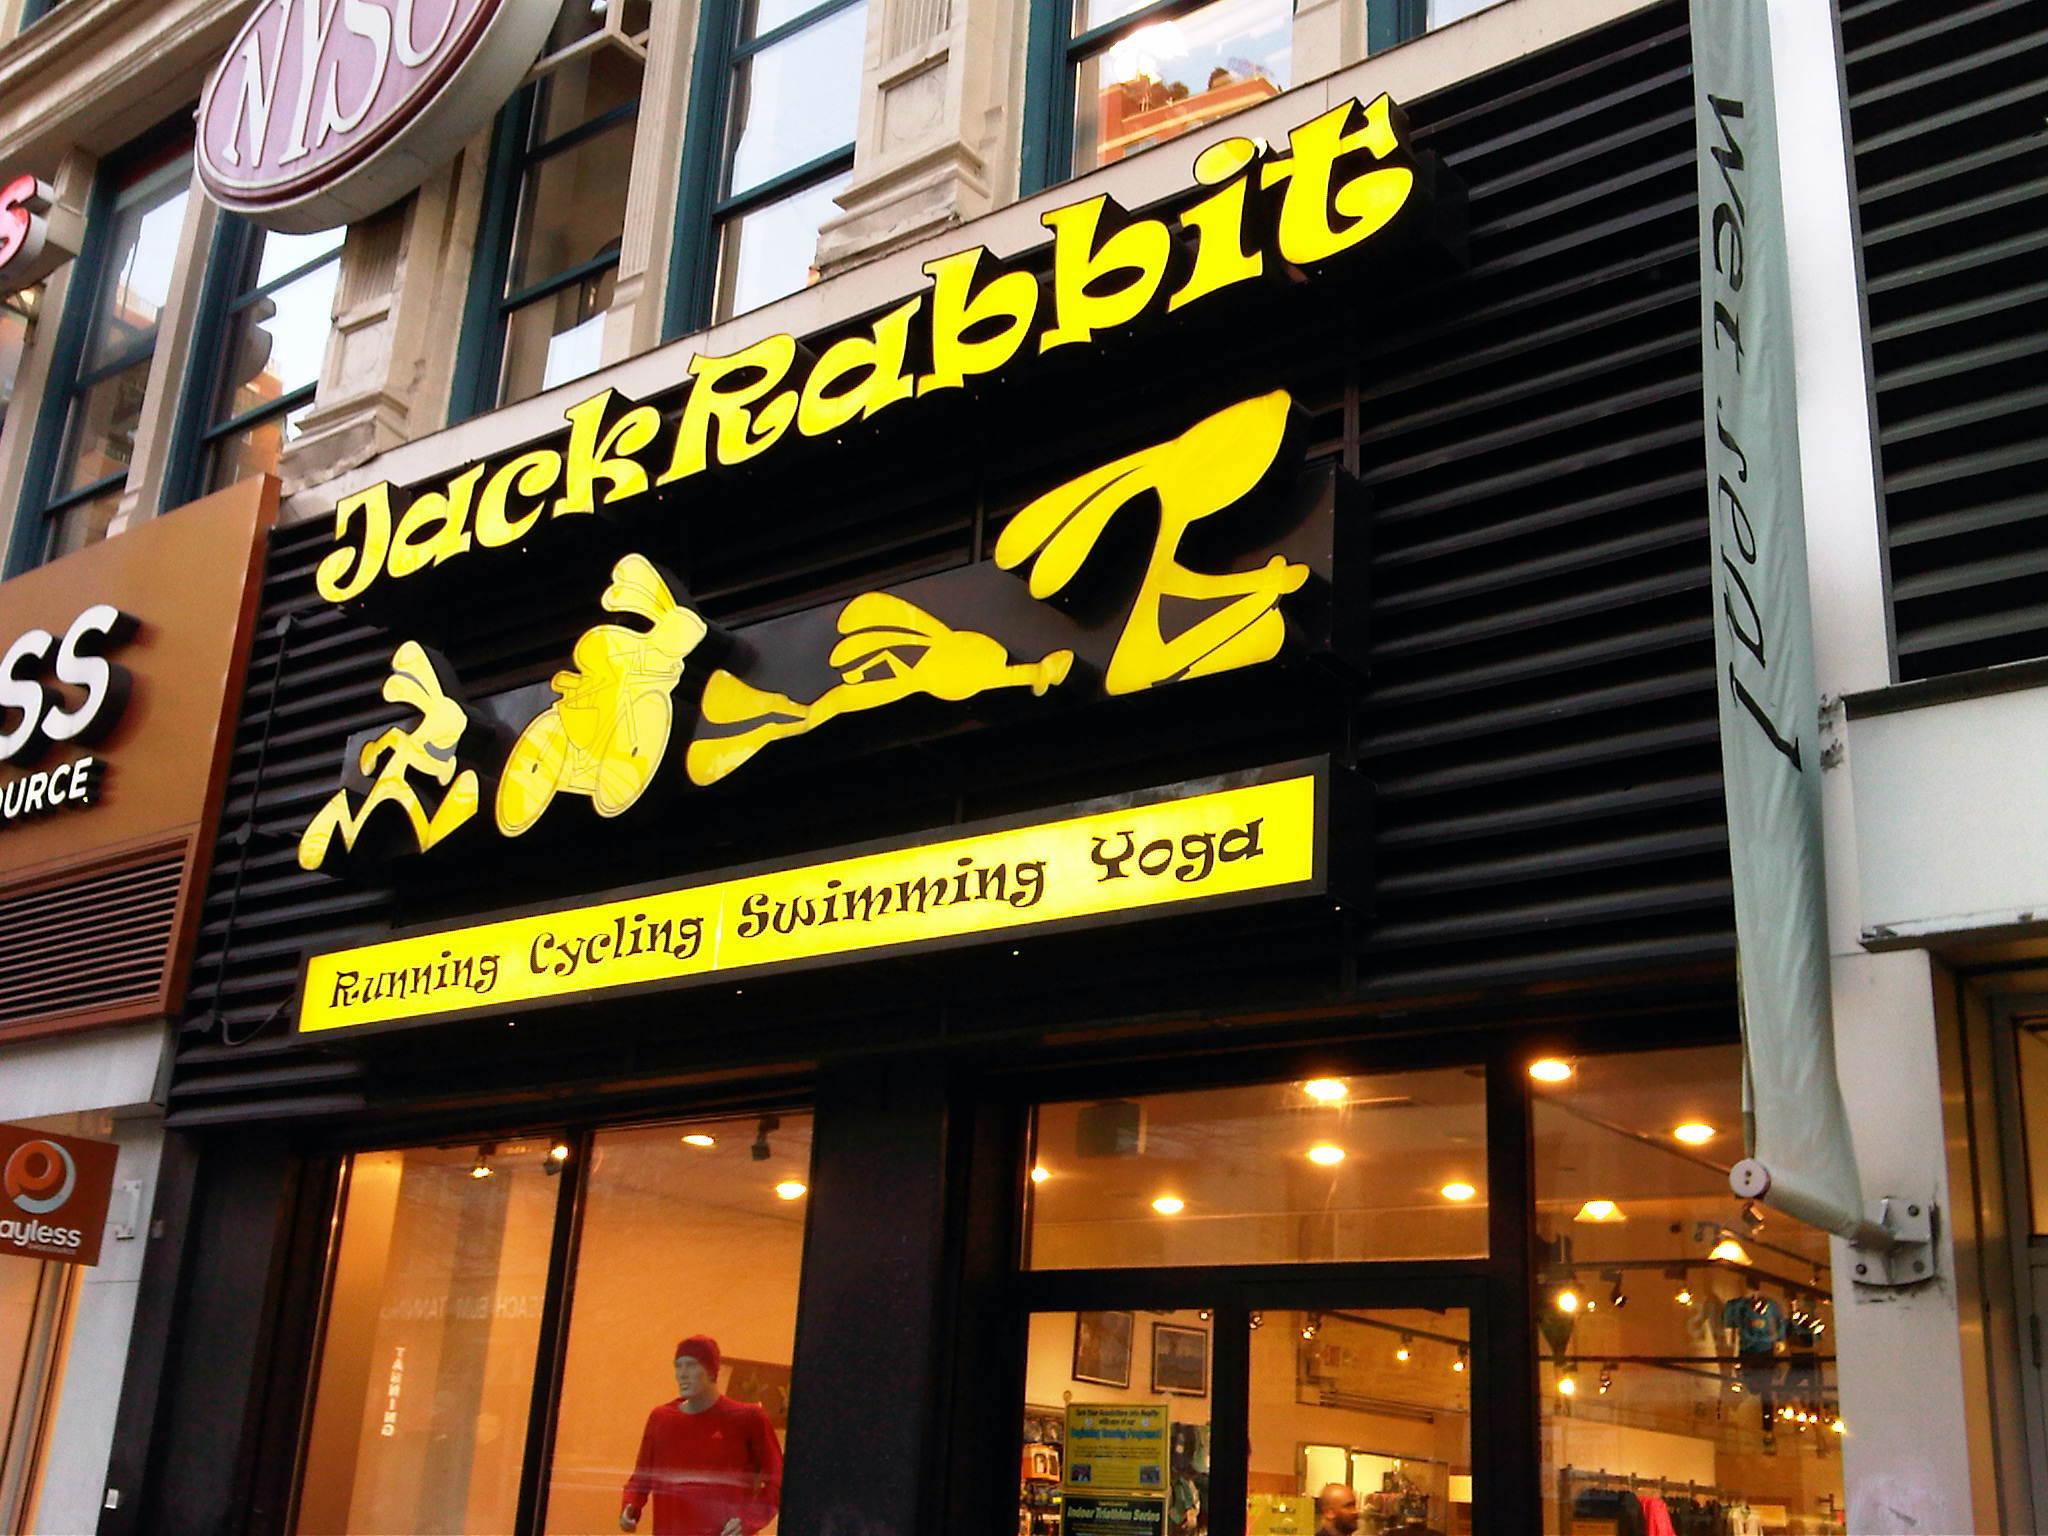 "<a href=""http://runstrongereveryday.com/tag/jackrabbit-sports/"">Run Stronger Every Day</a>"